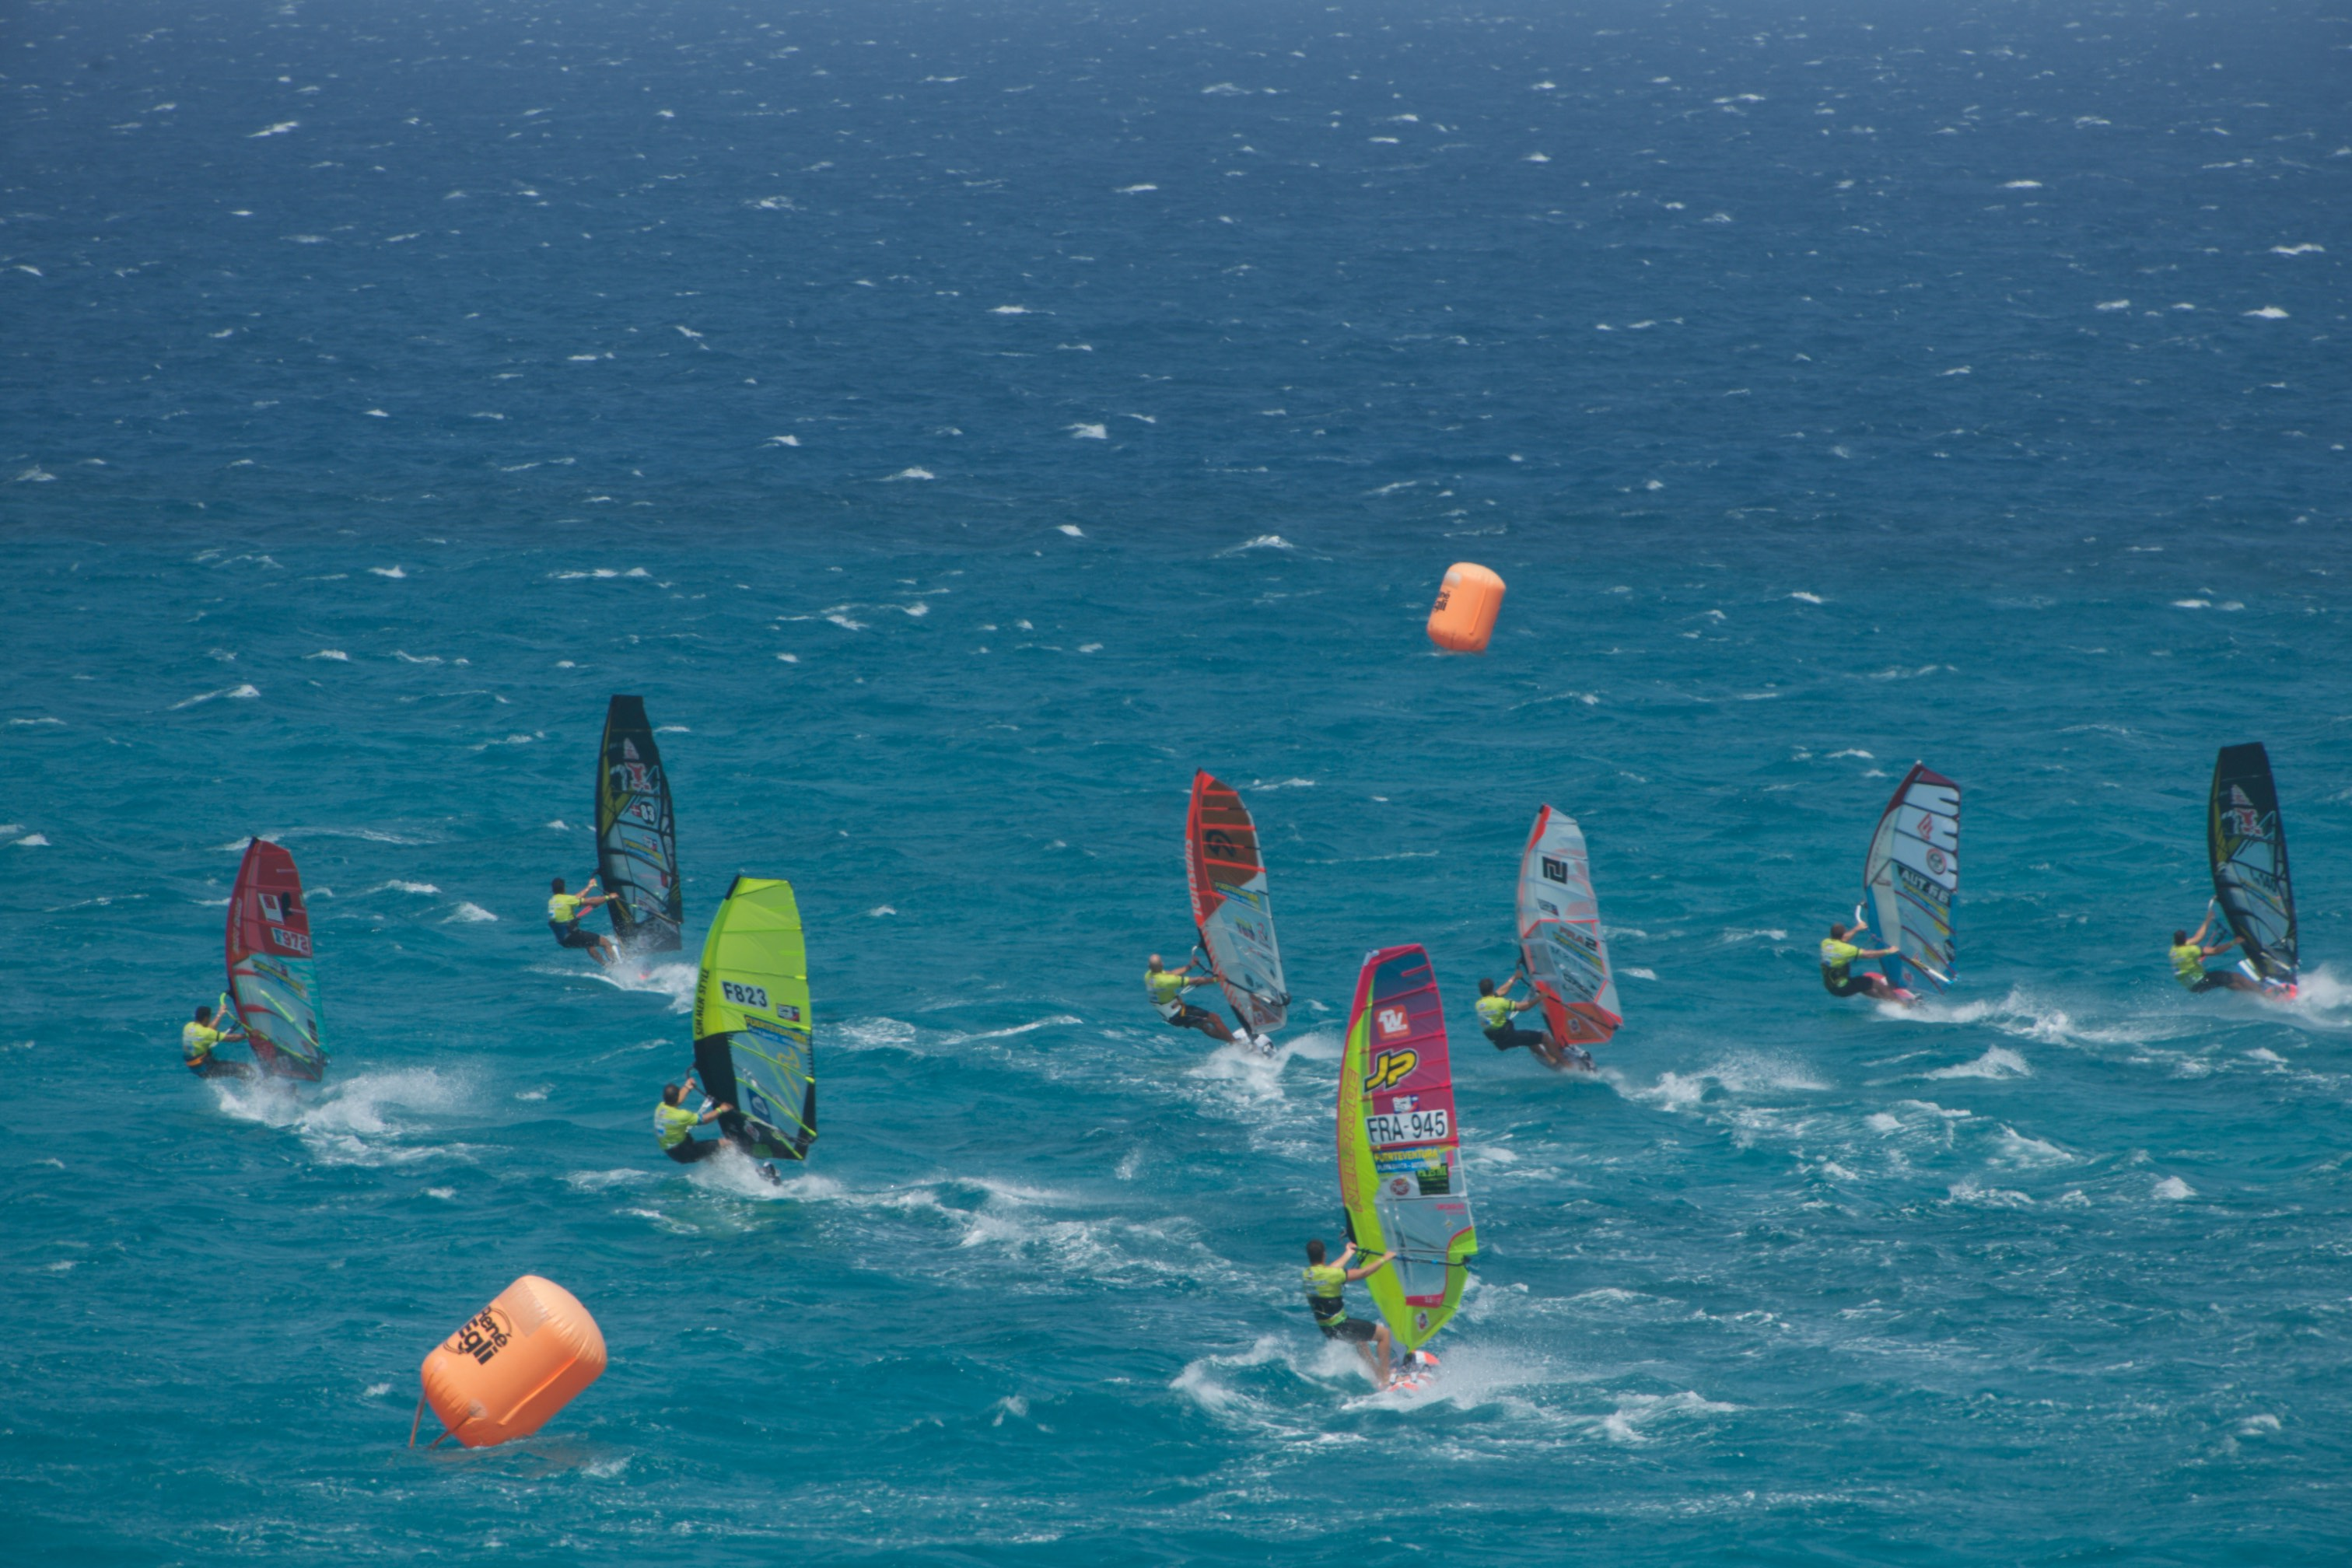 Tablas de windsurfing en la playa